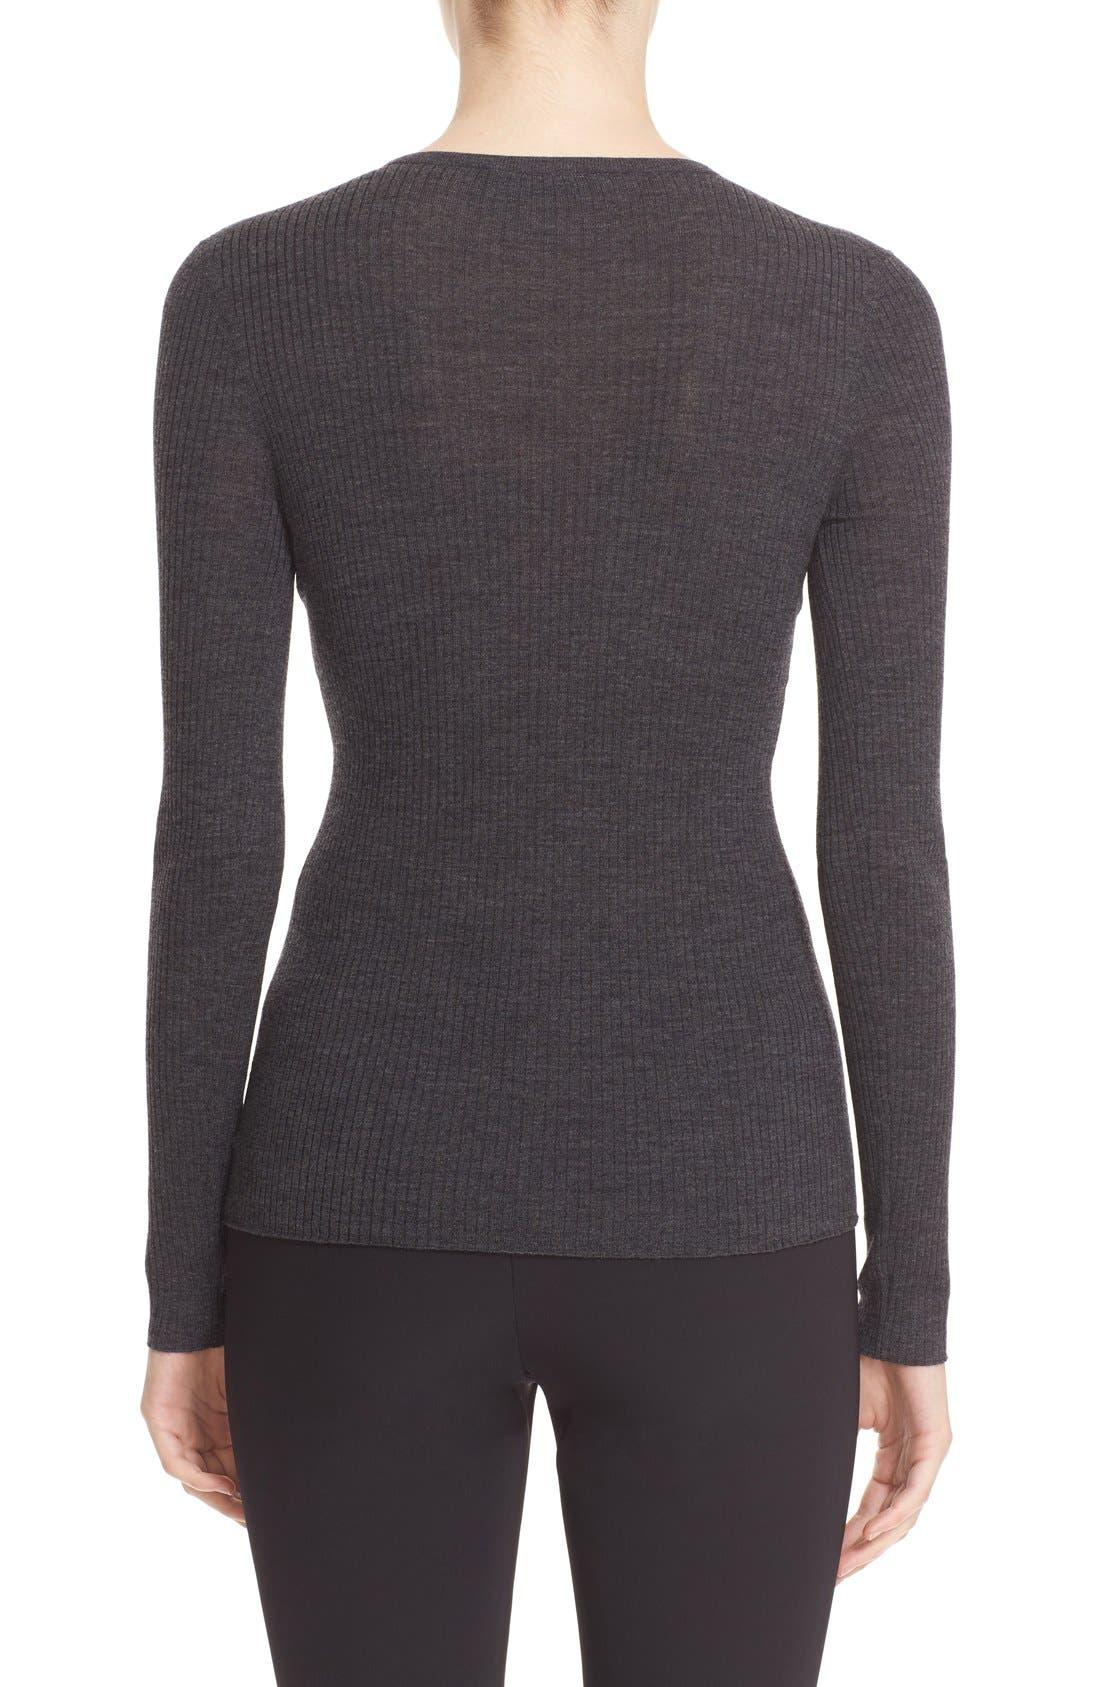 'Mirzi' Rib Knit Merino Wool Sweater,                             Alternate thumbnail 2, color,                             CHARCOAL MELANGE